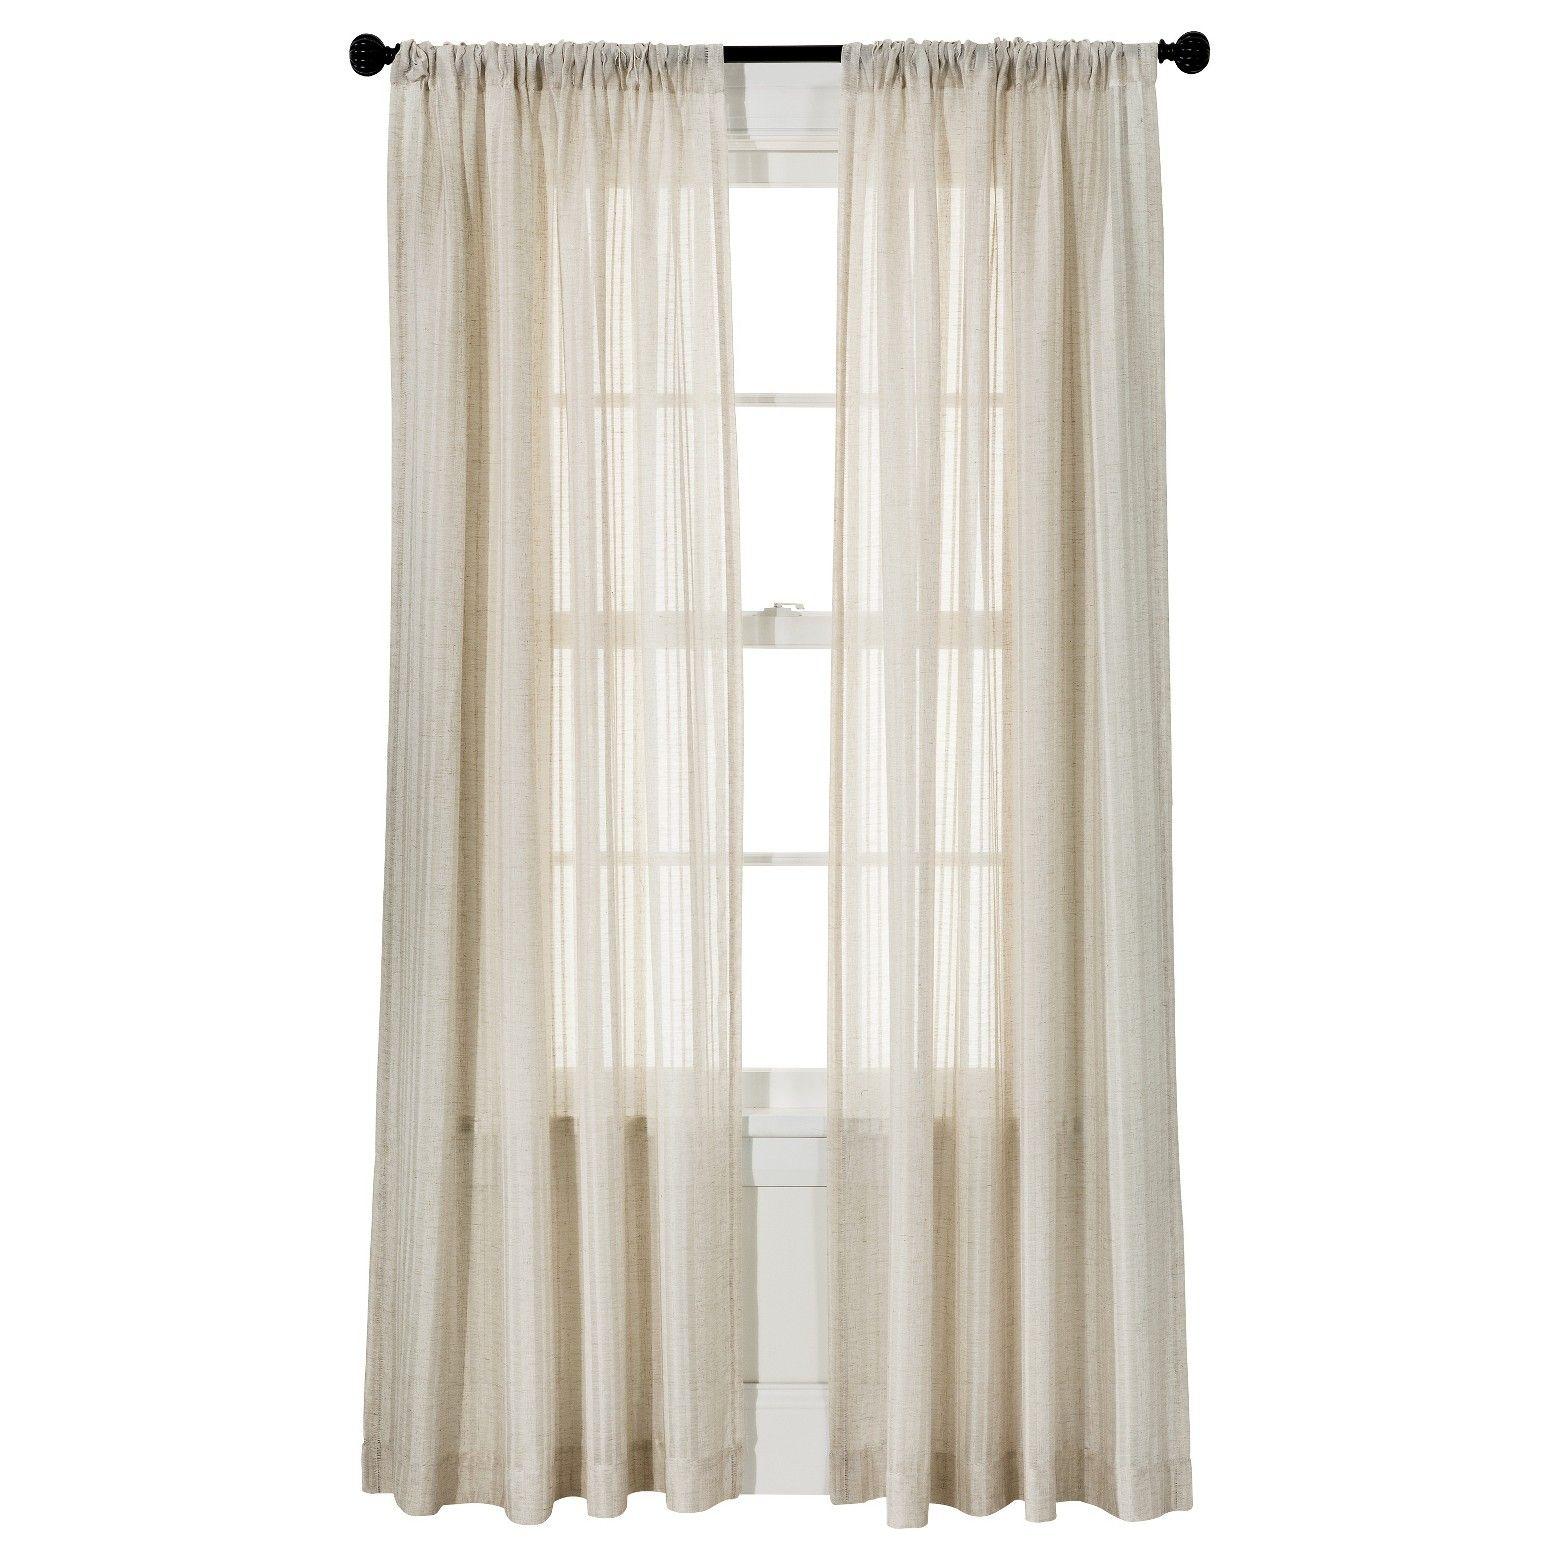 Threshold leno weave sheer curtain panel window sheers window and